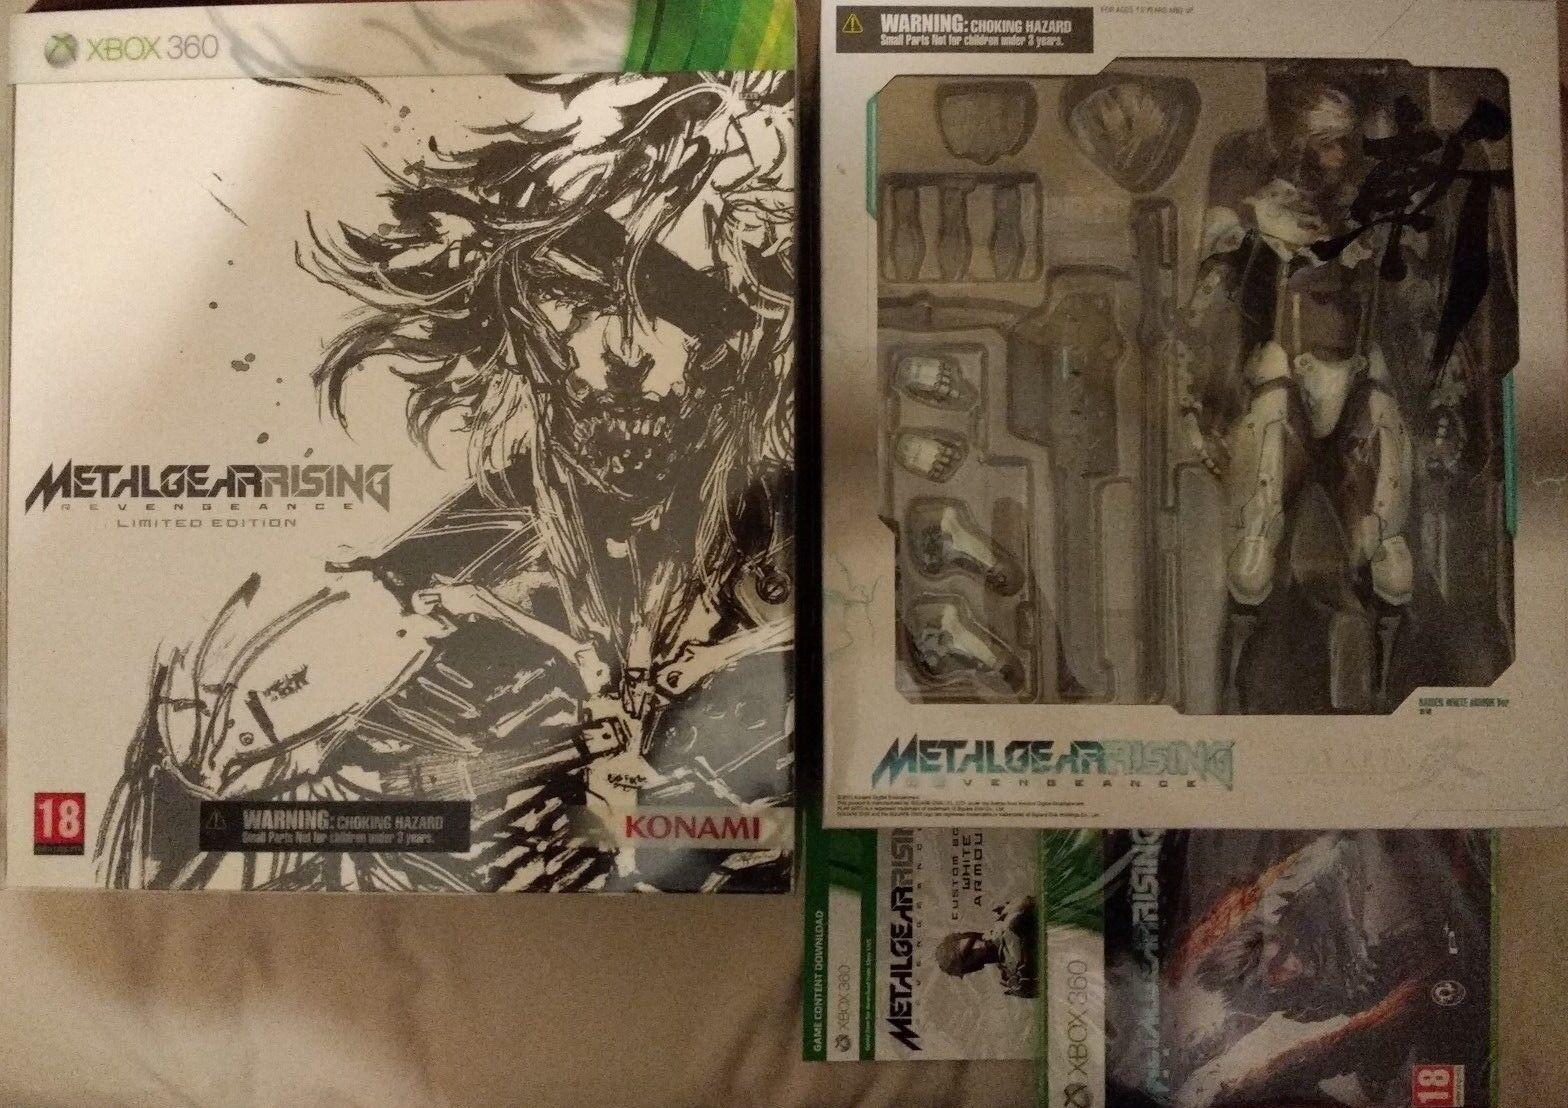 Metal Gear Rising Play Arts Kai Raiden White Limited Figure With Game XBOX360